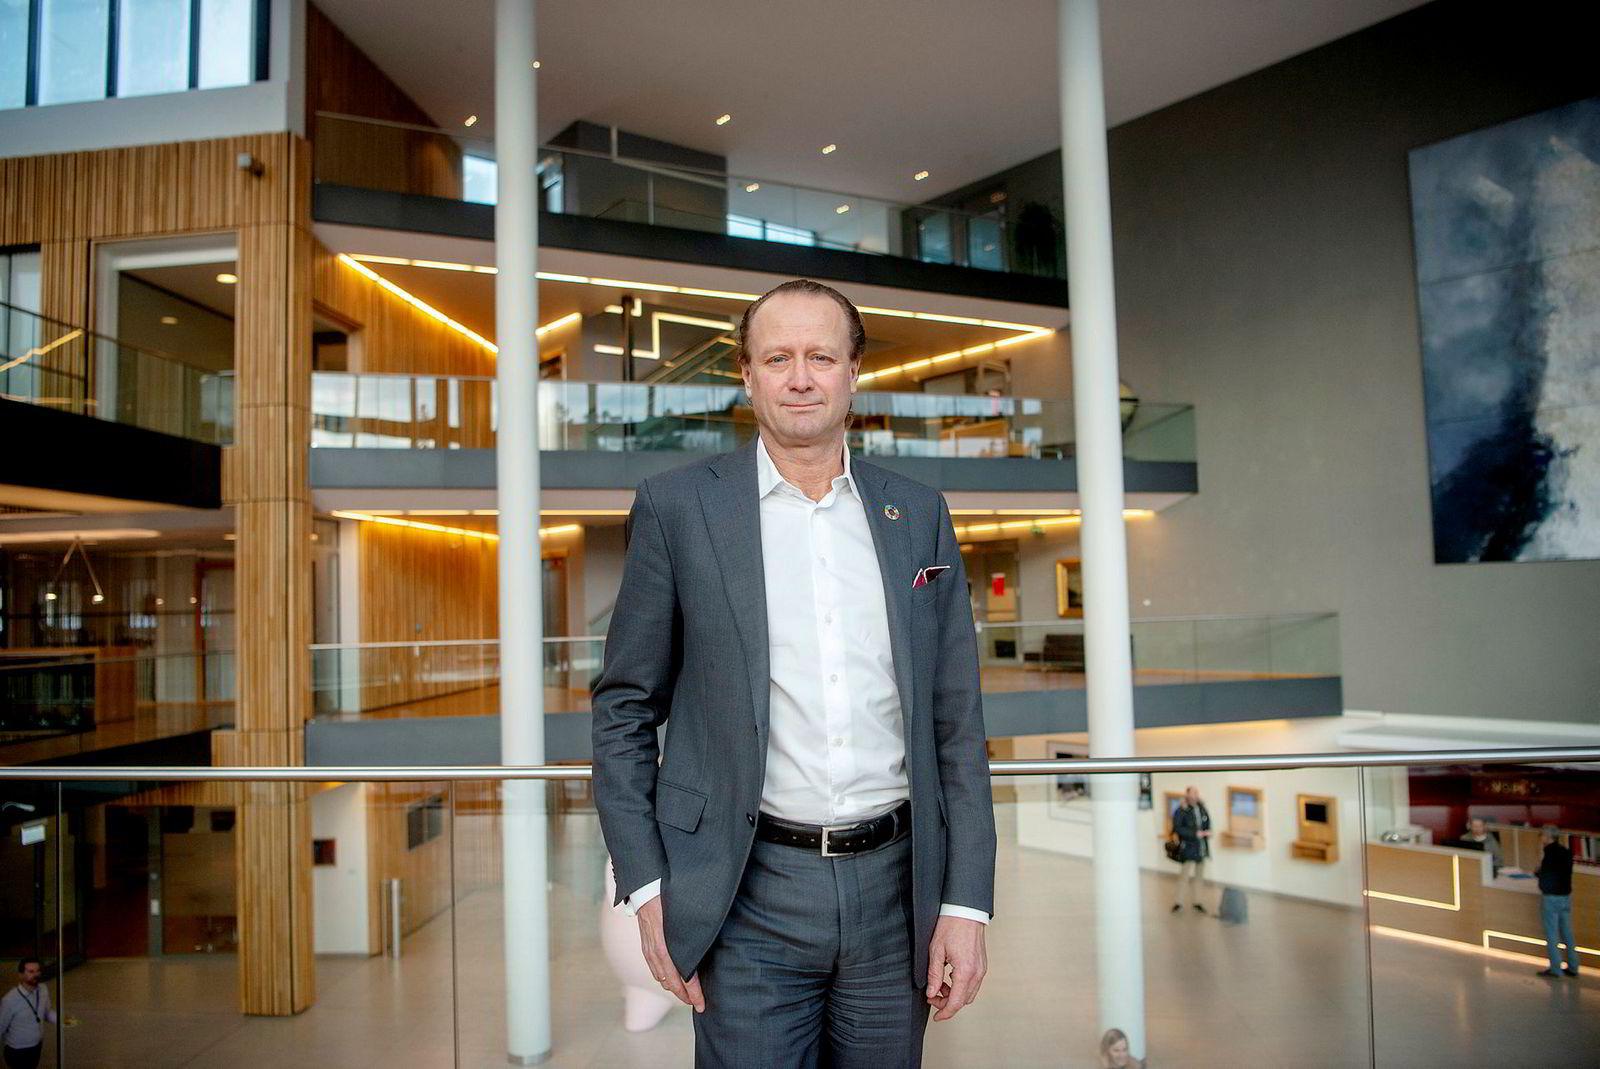 Konserndirektør for kapitalforvaltning i Storebrand, Jan Erik Saugstad, forventer langsiktige klimamål fra Equinor.